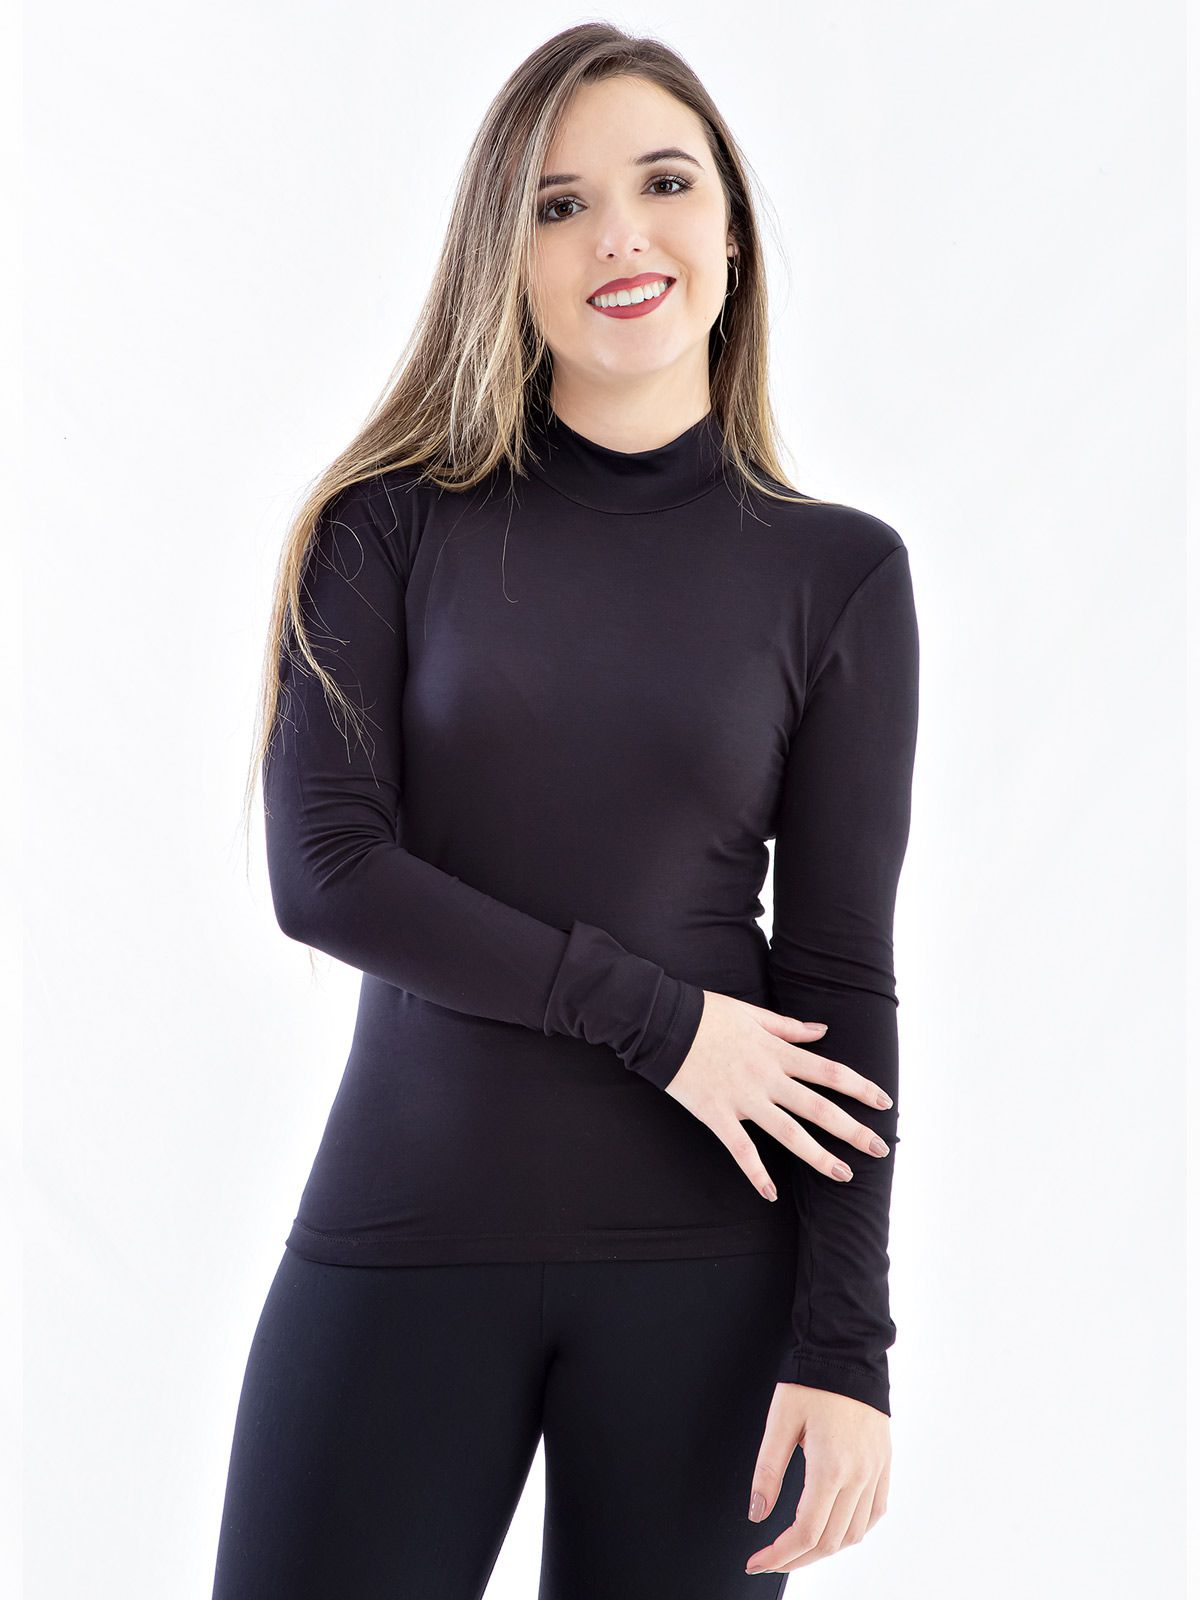 Blusa Feminina de Viscolycra Gola Alta Anistia Preta